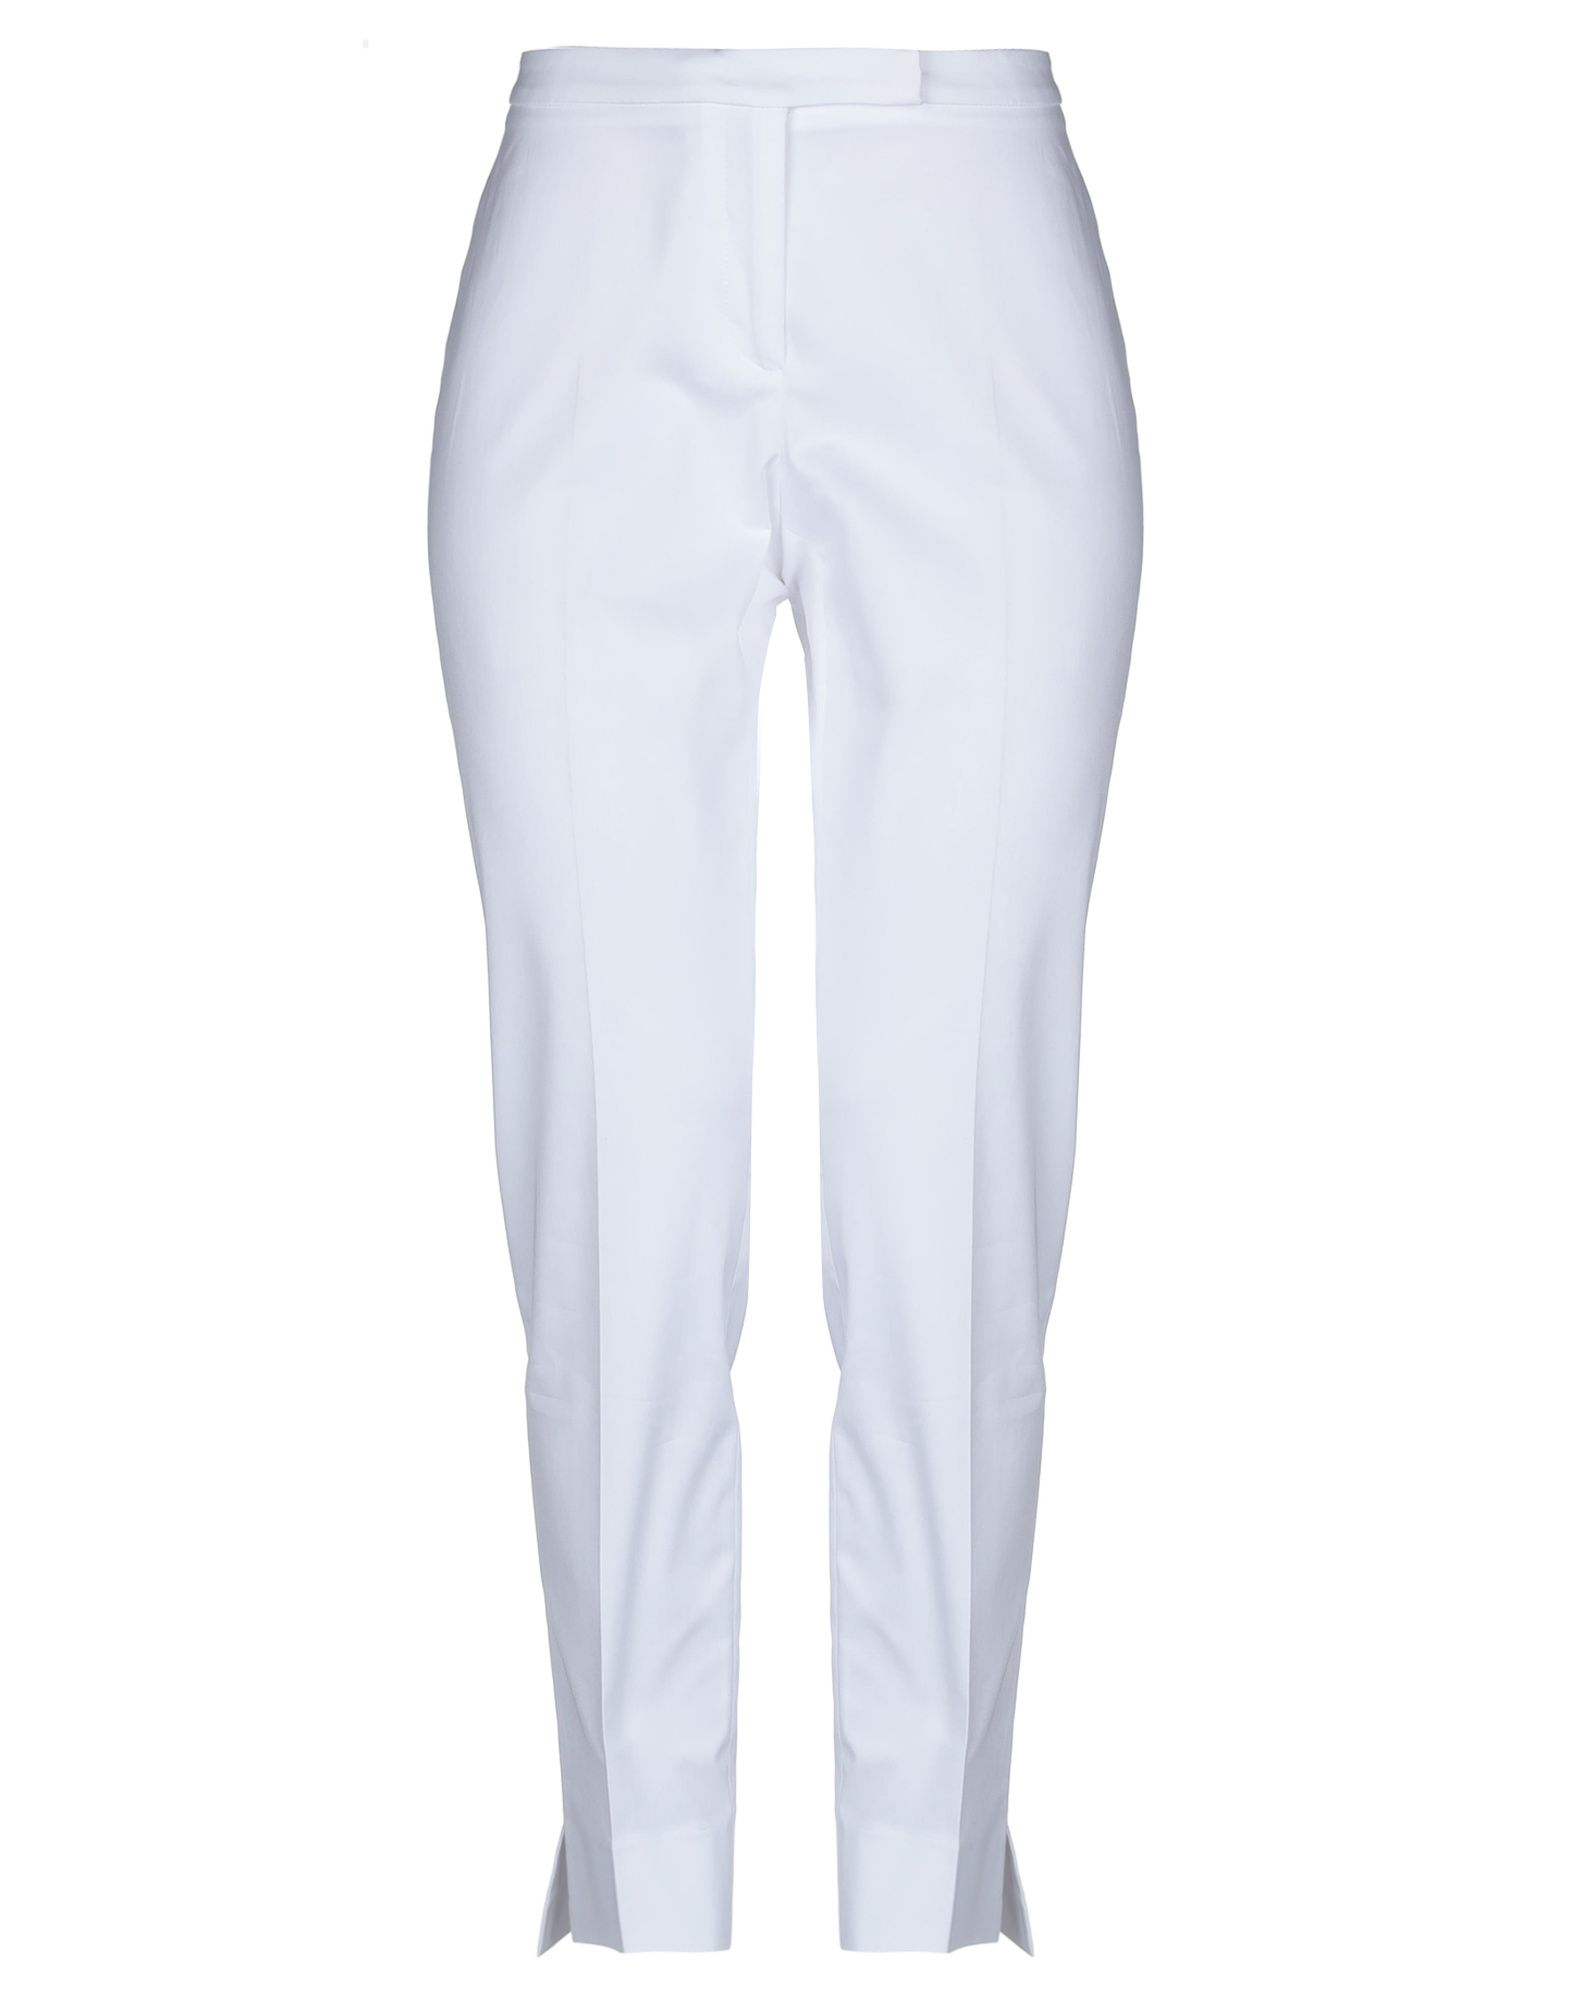 Pantalone Peserico Sign Sign donna - 13267619SA  Kostenlose Lieferung und Rückgabe